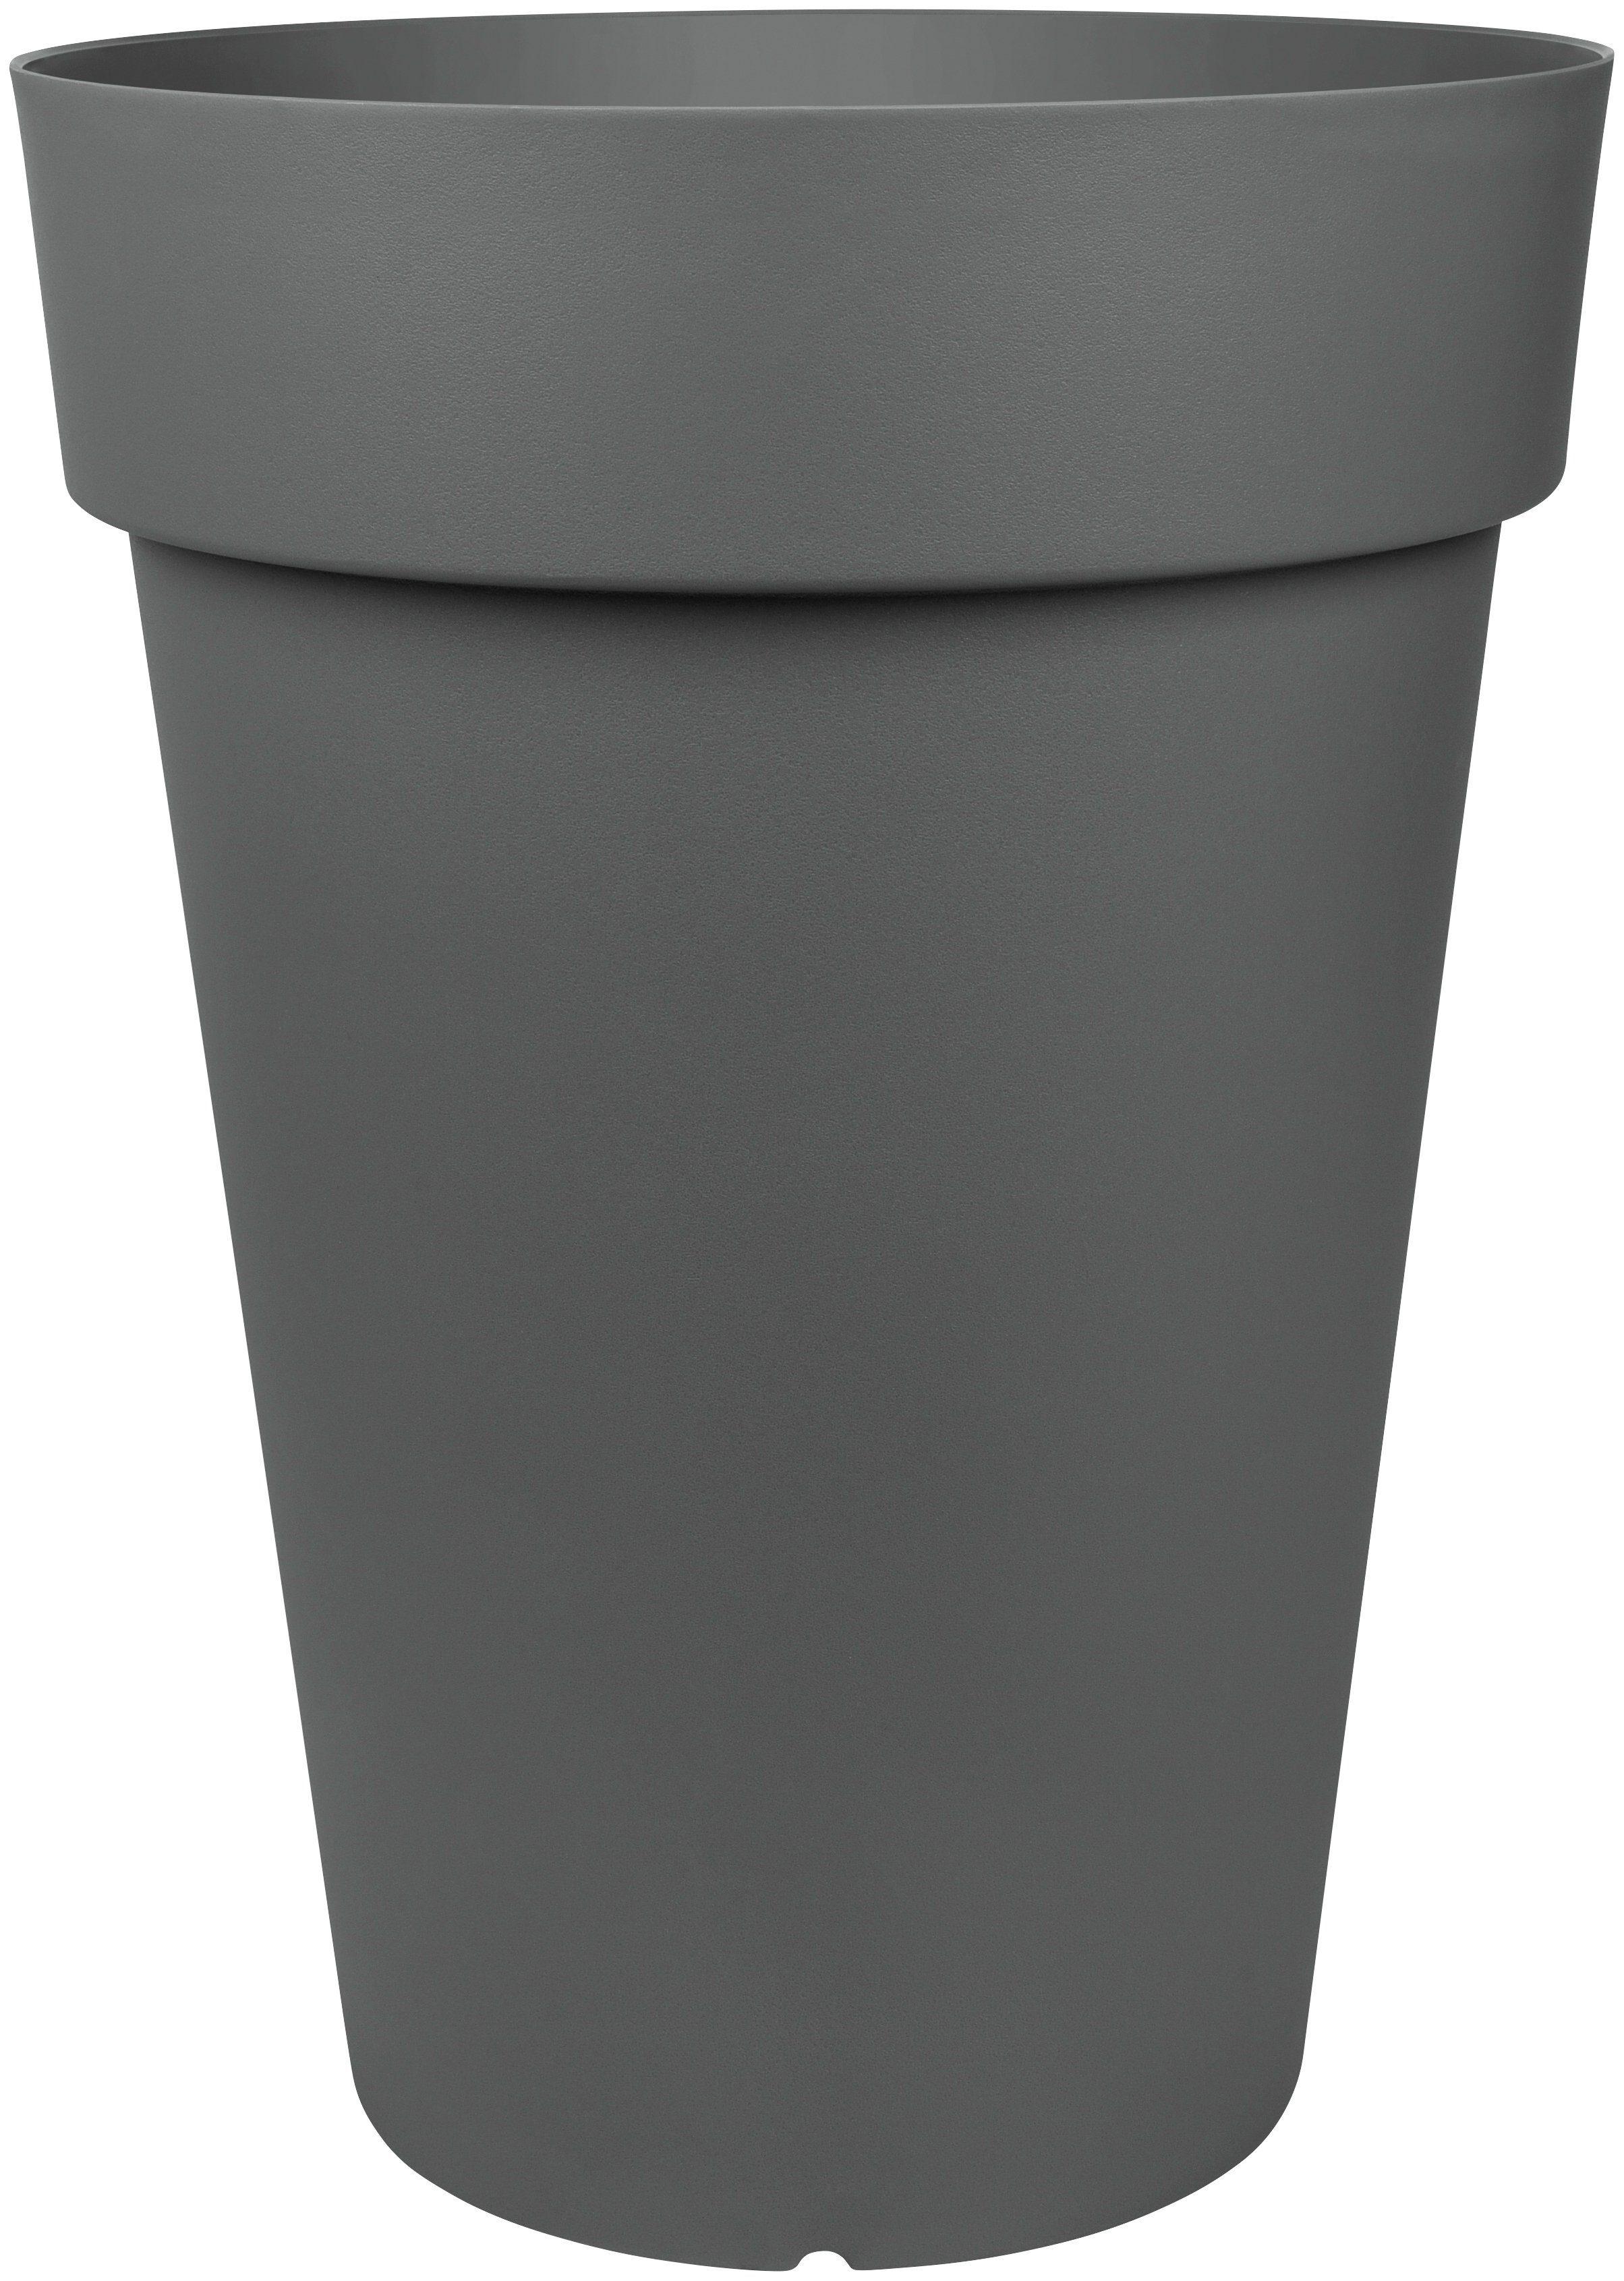 Emsa Blumenkasten »CITY CLASSIC Kübel«, Ø/H: 40/52 cm, granit